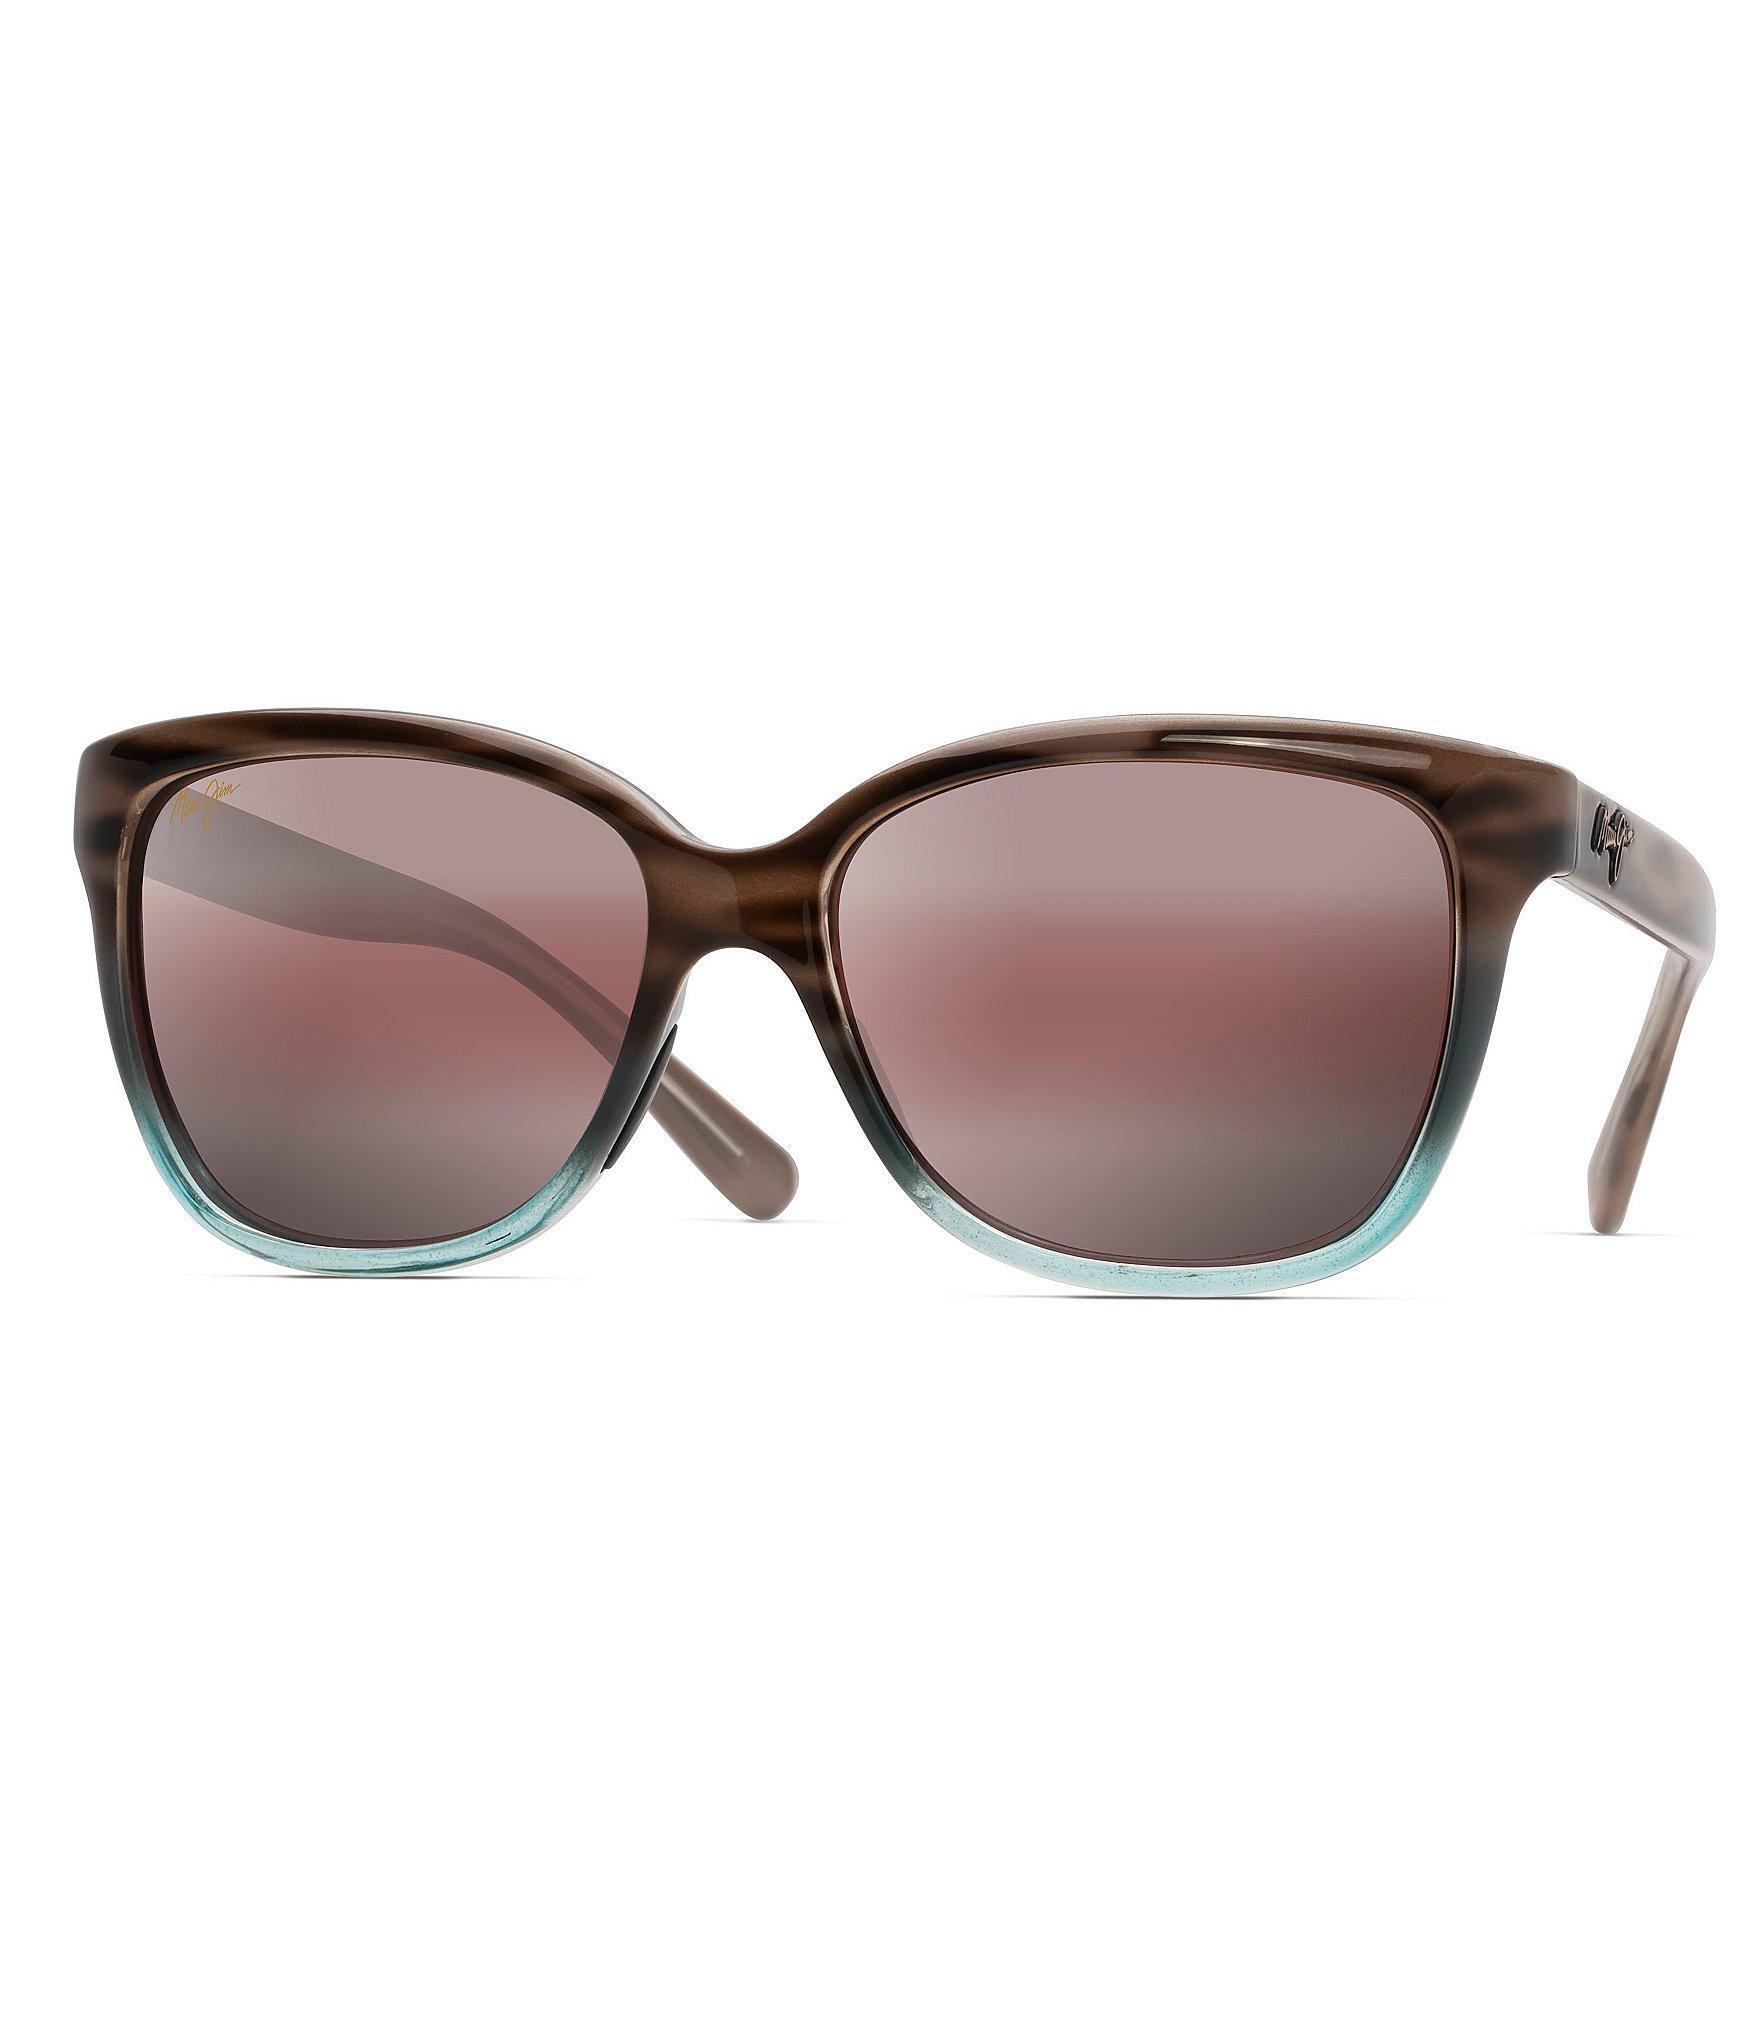 6fc20a04e49b Lyst - Maui Jim Starfish Gradient Polarized Sunglasses in Brown